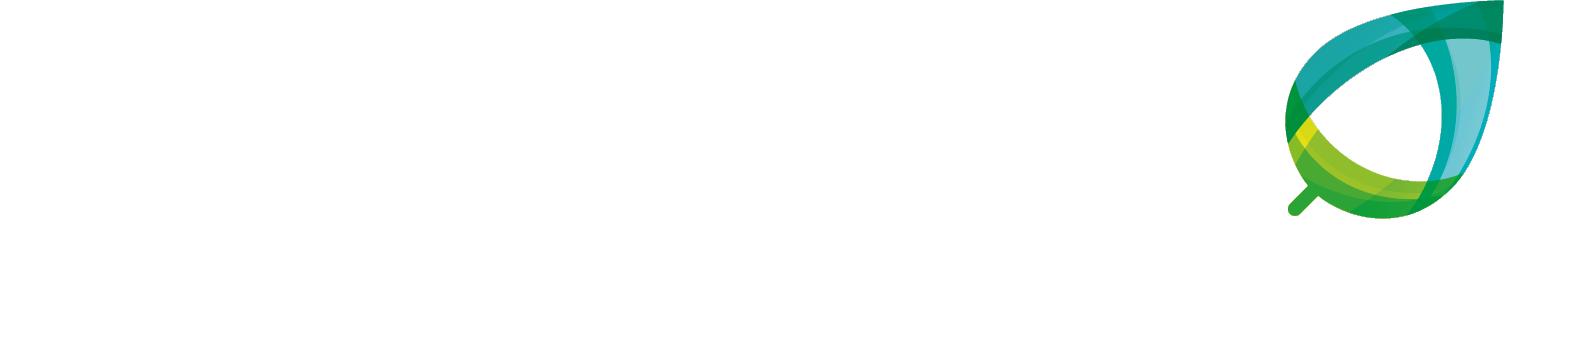 environment-ireland-logo@2x.png